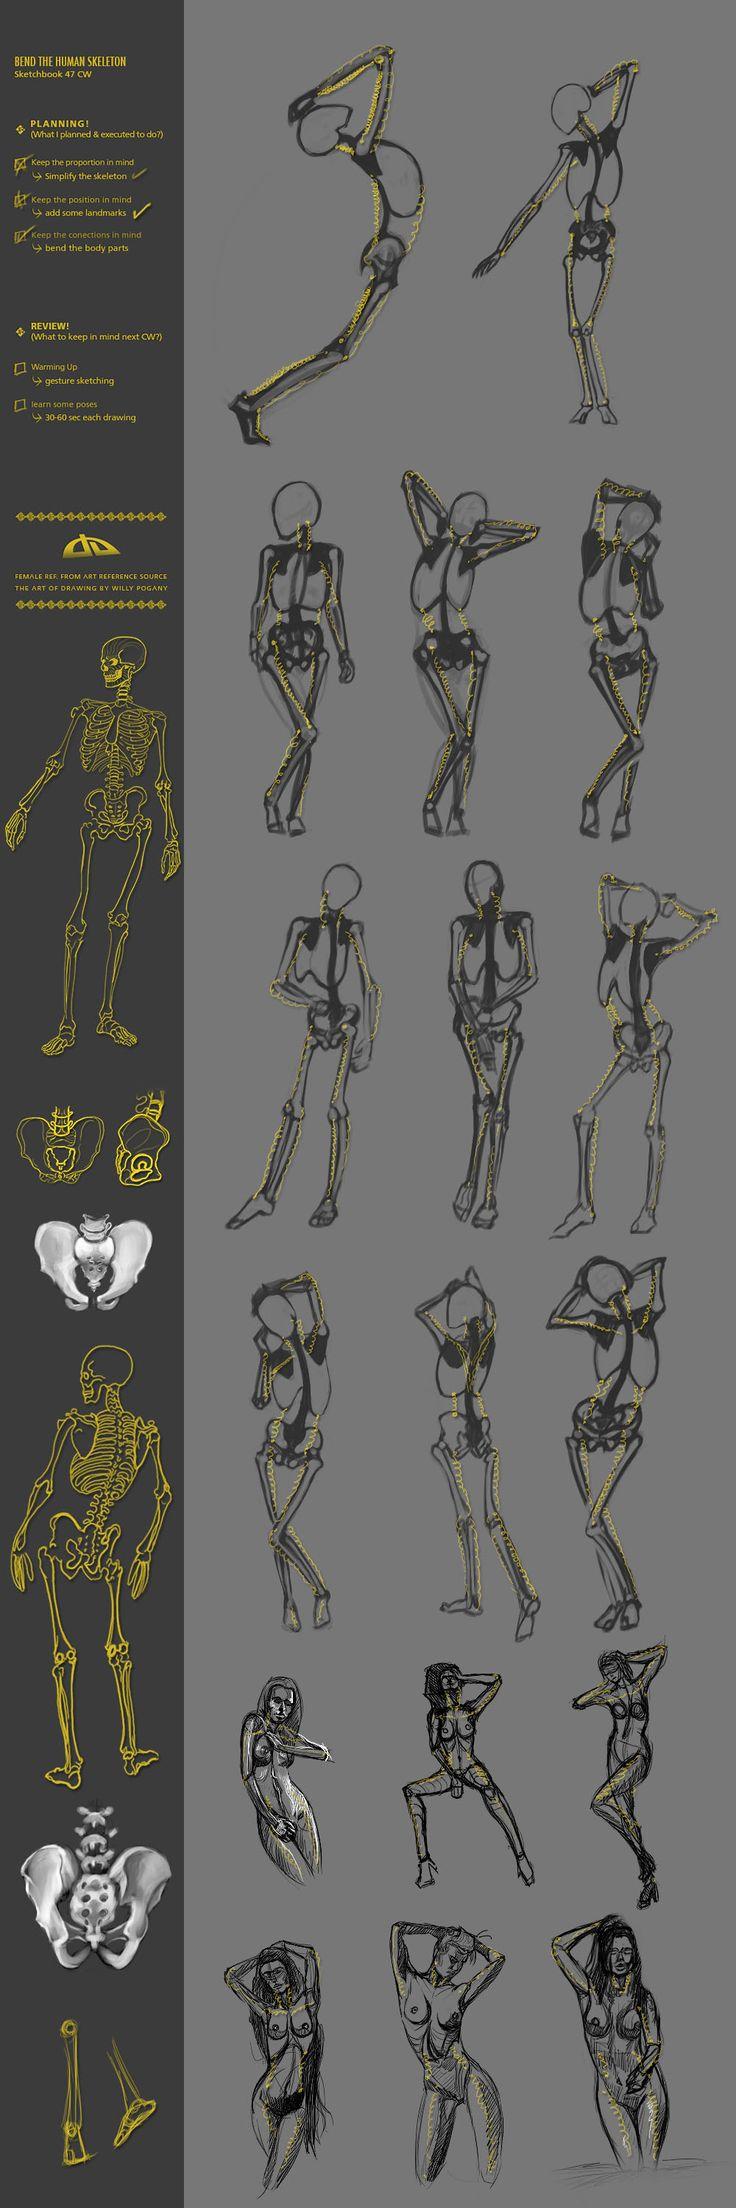 Bend the human skeleton 47CW by JustIRaziel.deviantart.com on @deviantART